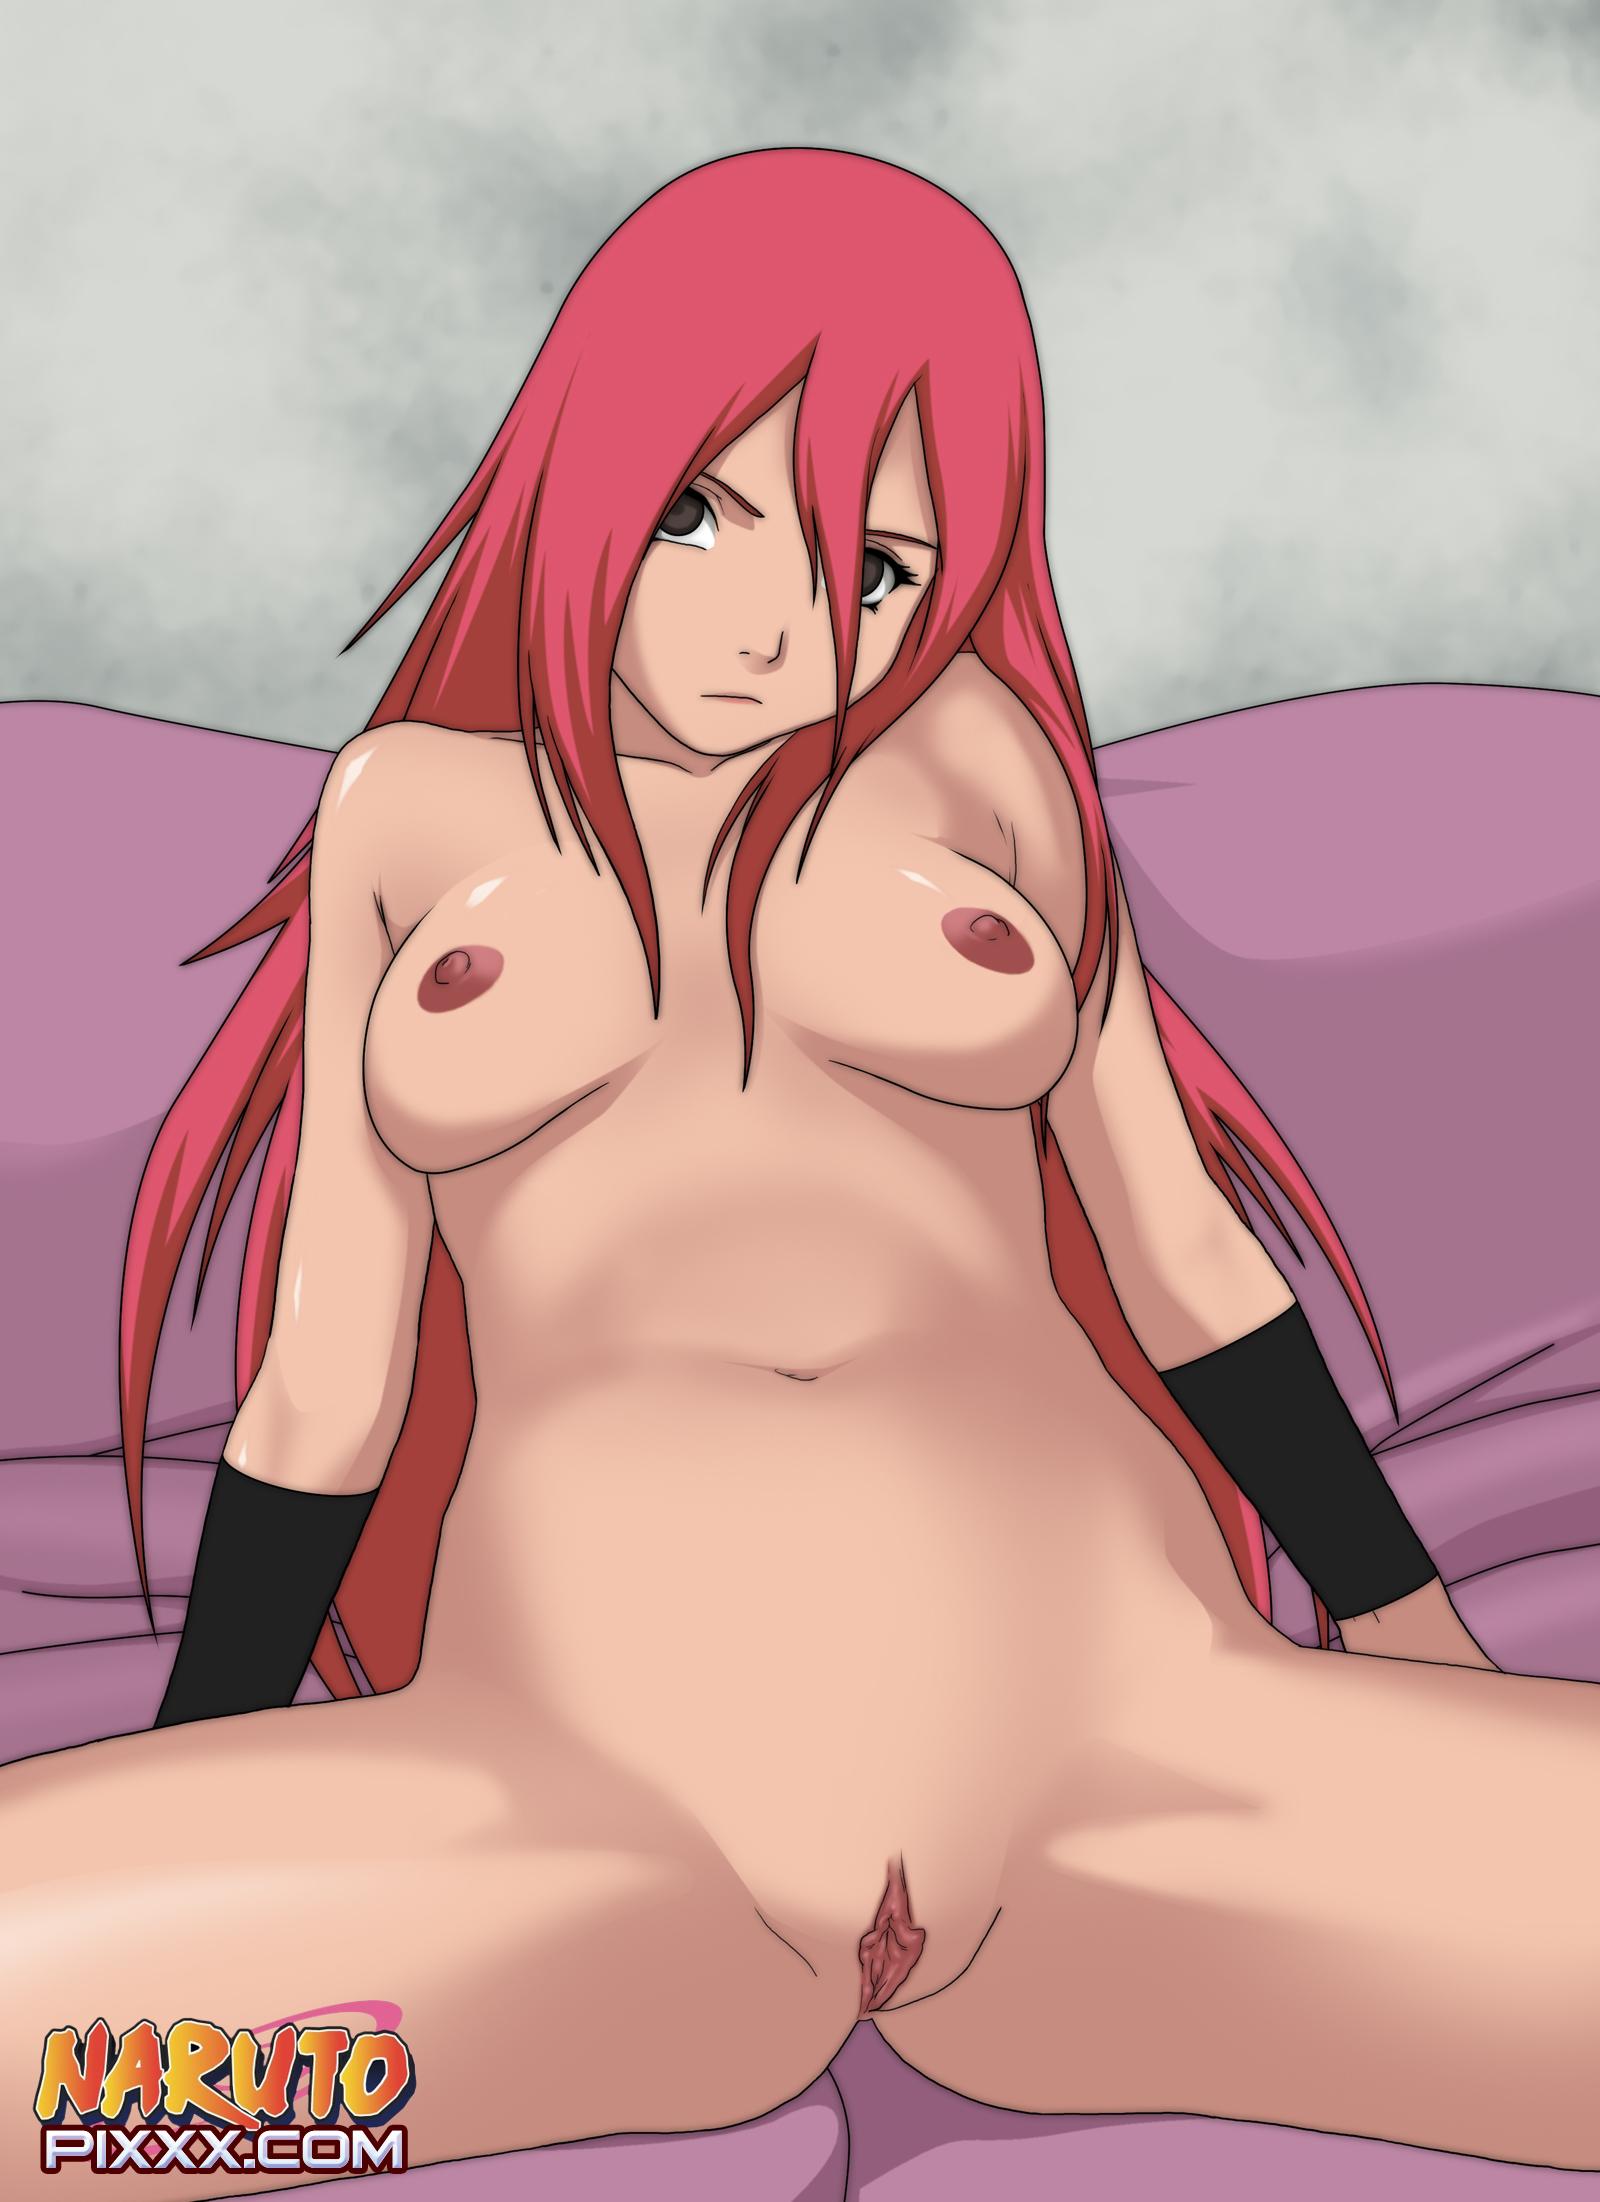 Xxxx lesbian giant tits